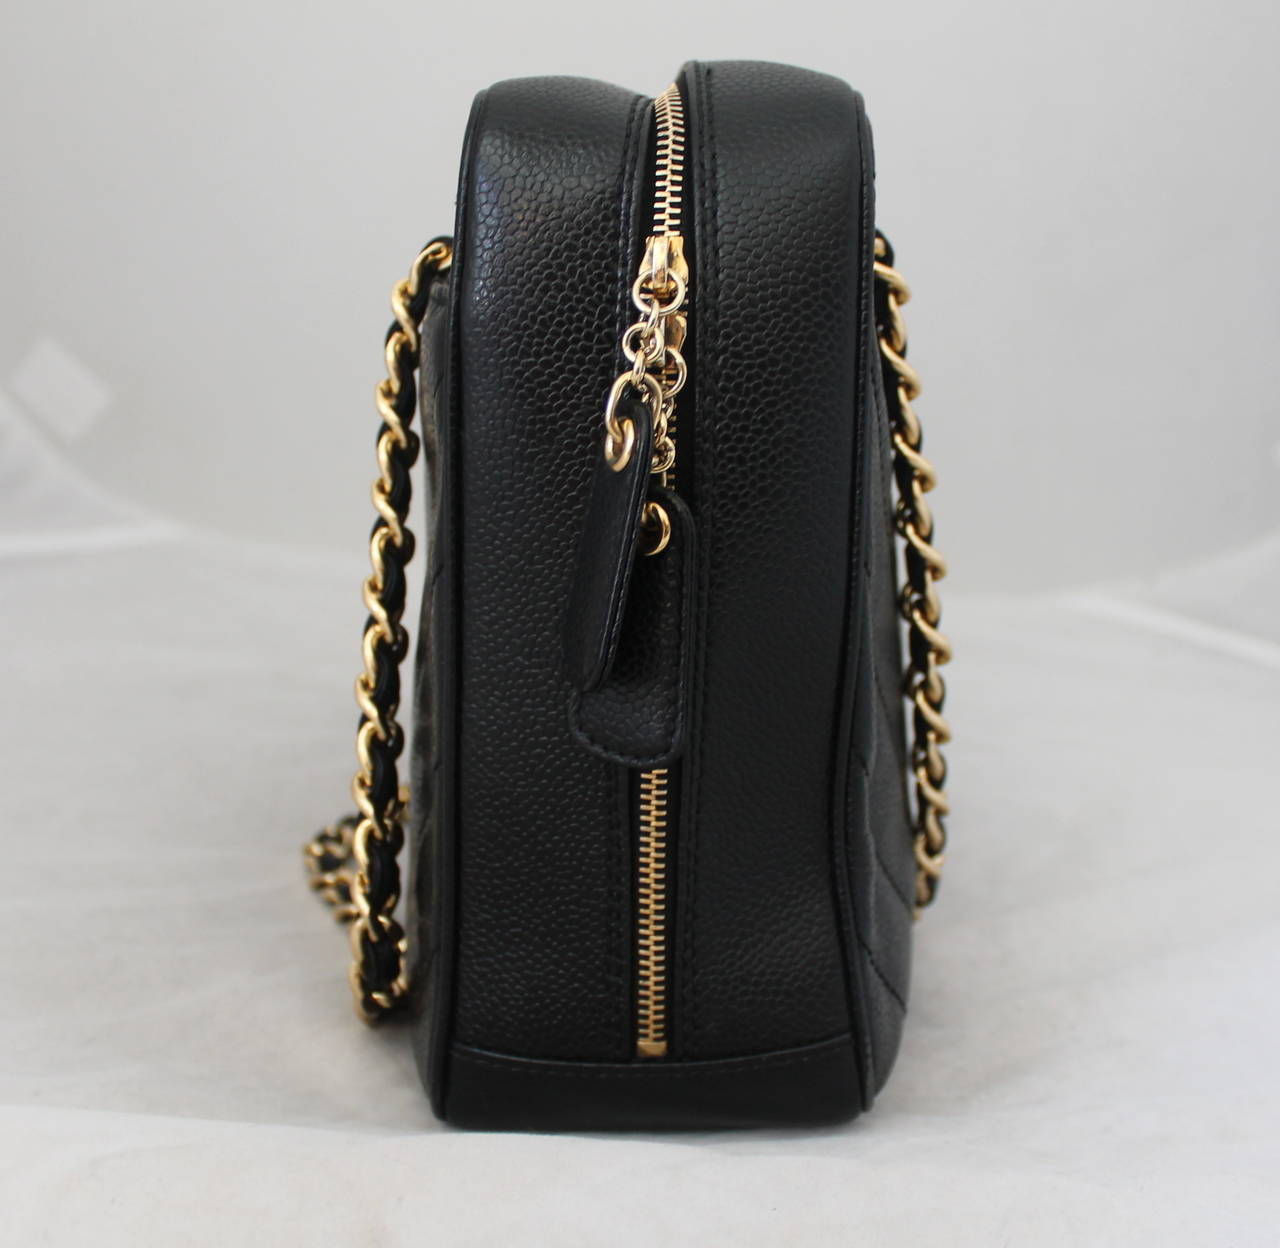 27c9a05da101b7 Chanel 2002 Black Caviar Chevron Quilted Camera Case Bag In Good Condition  For Sale In Palm